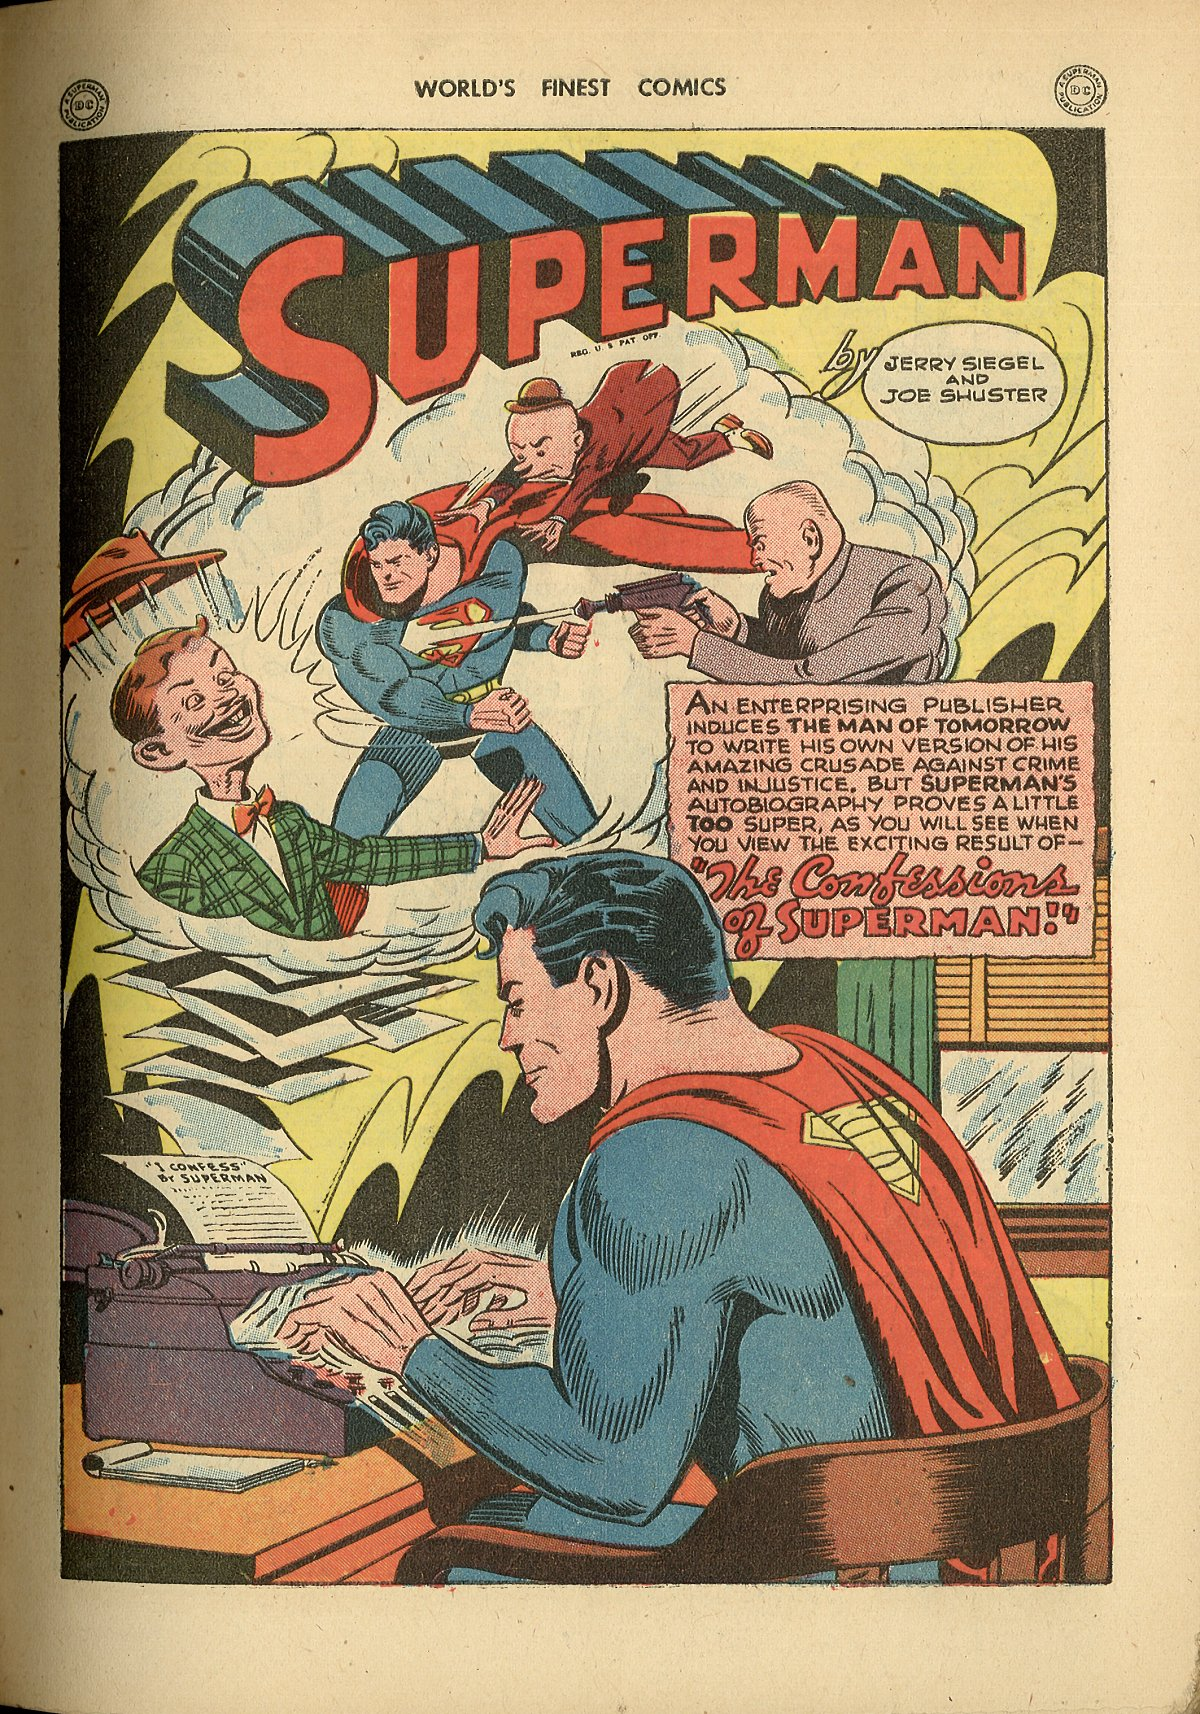 Read online World's Finest Comics comic -  Issue #26 - 3